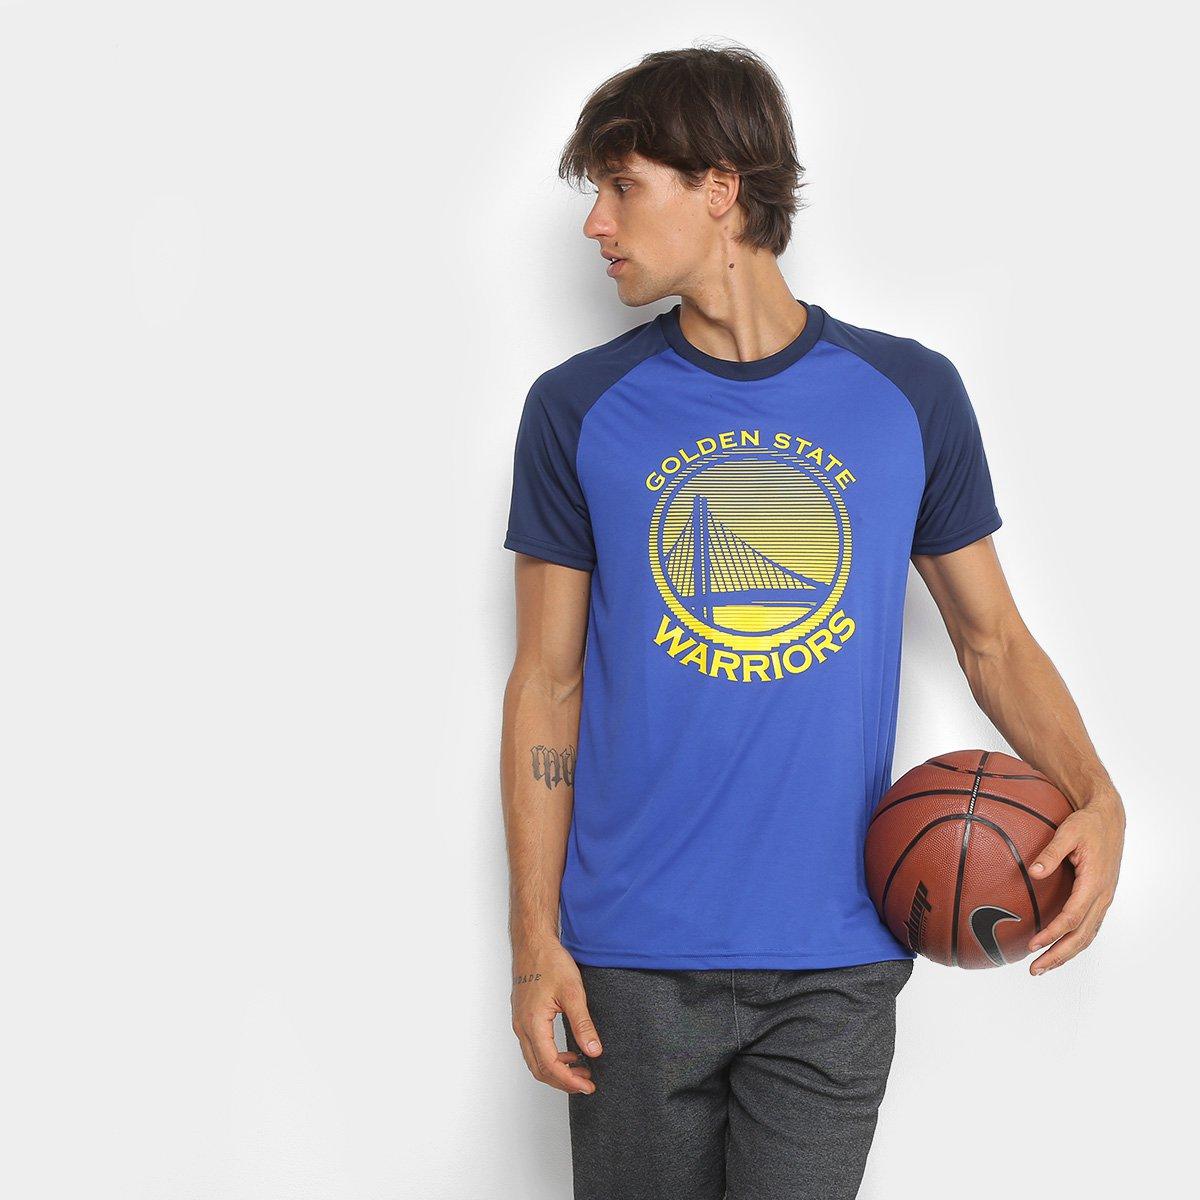 6802e3b47 Camiseta NBA Golden State Warriors Masculina - Shopping TudoAzul